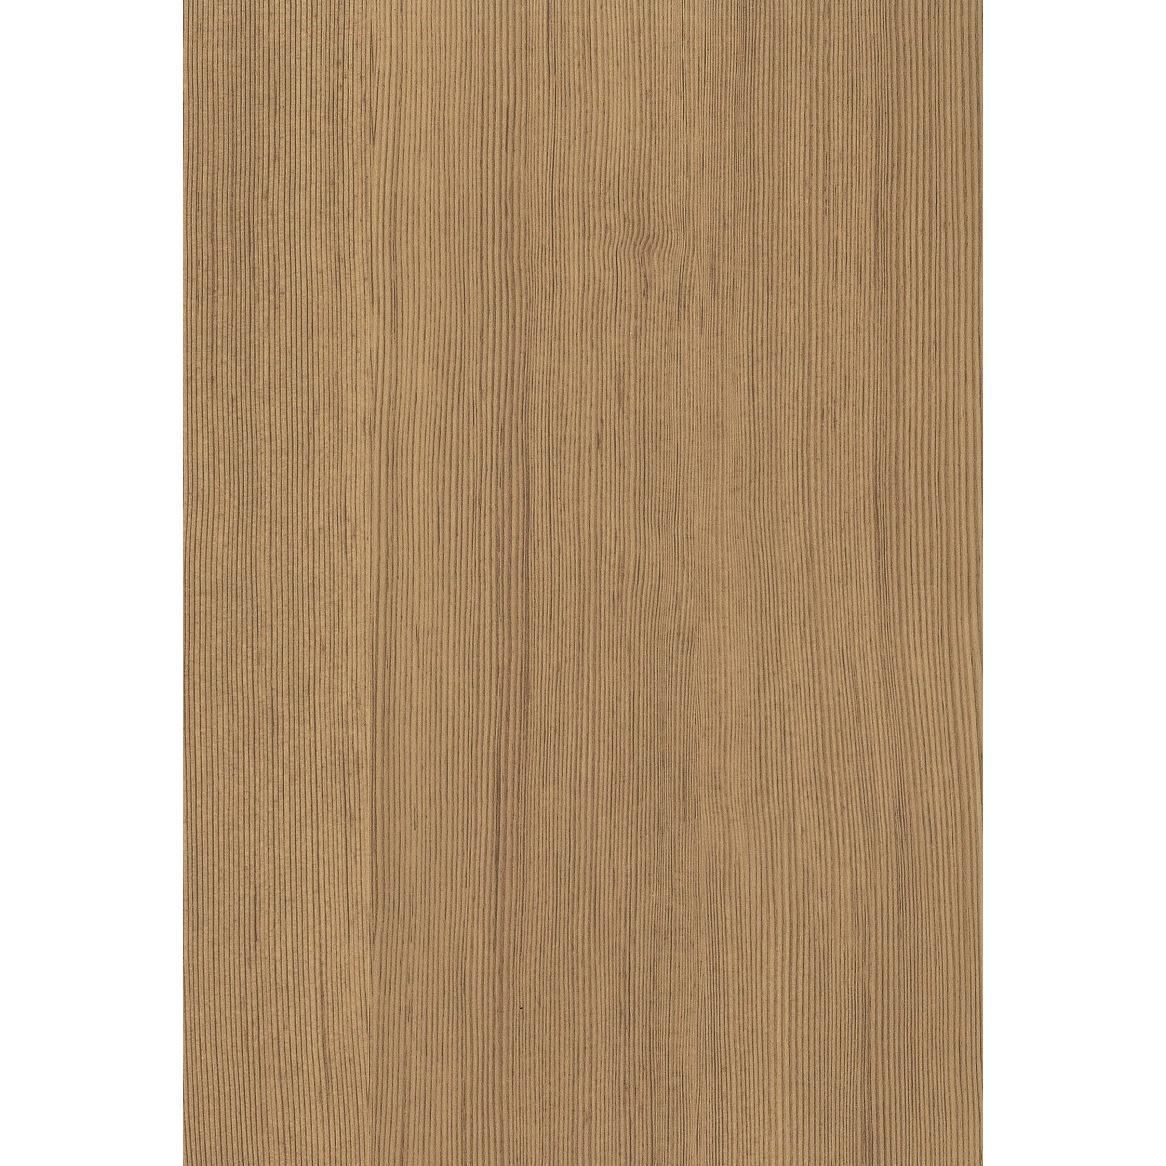 WOL - Laminate 4 x 8 thickness 0.7 mm Sheets - Torrey Pinnace - HPL